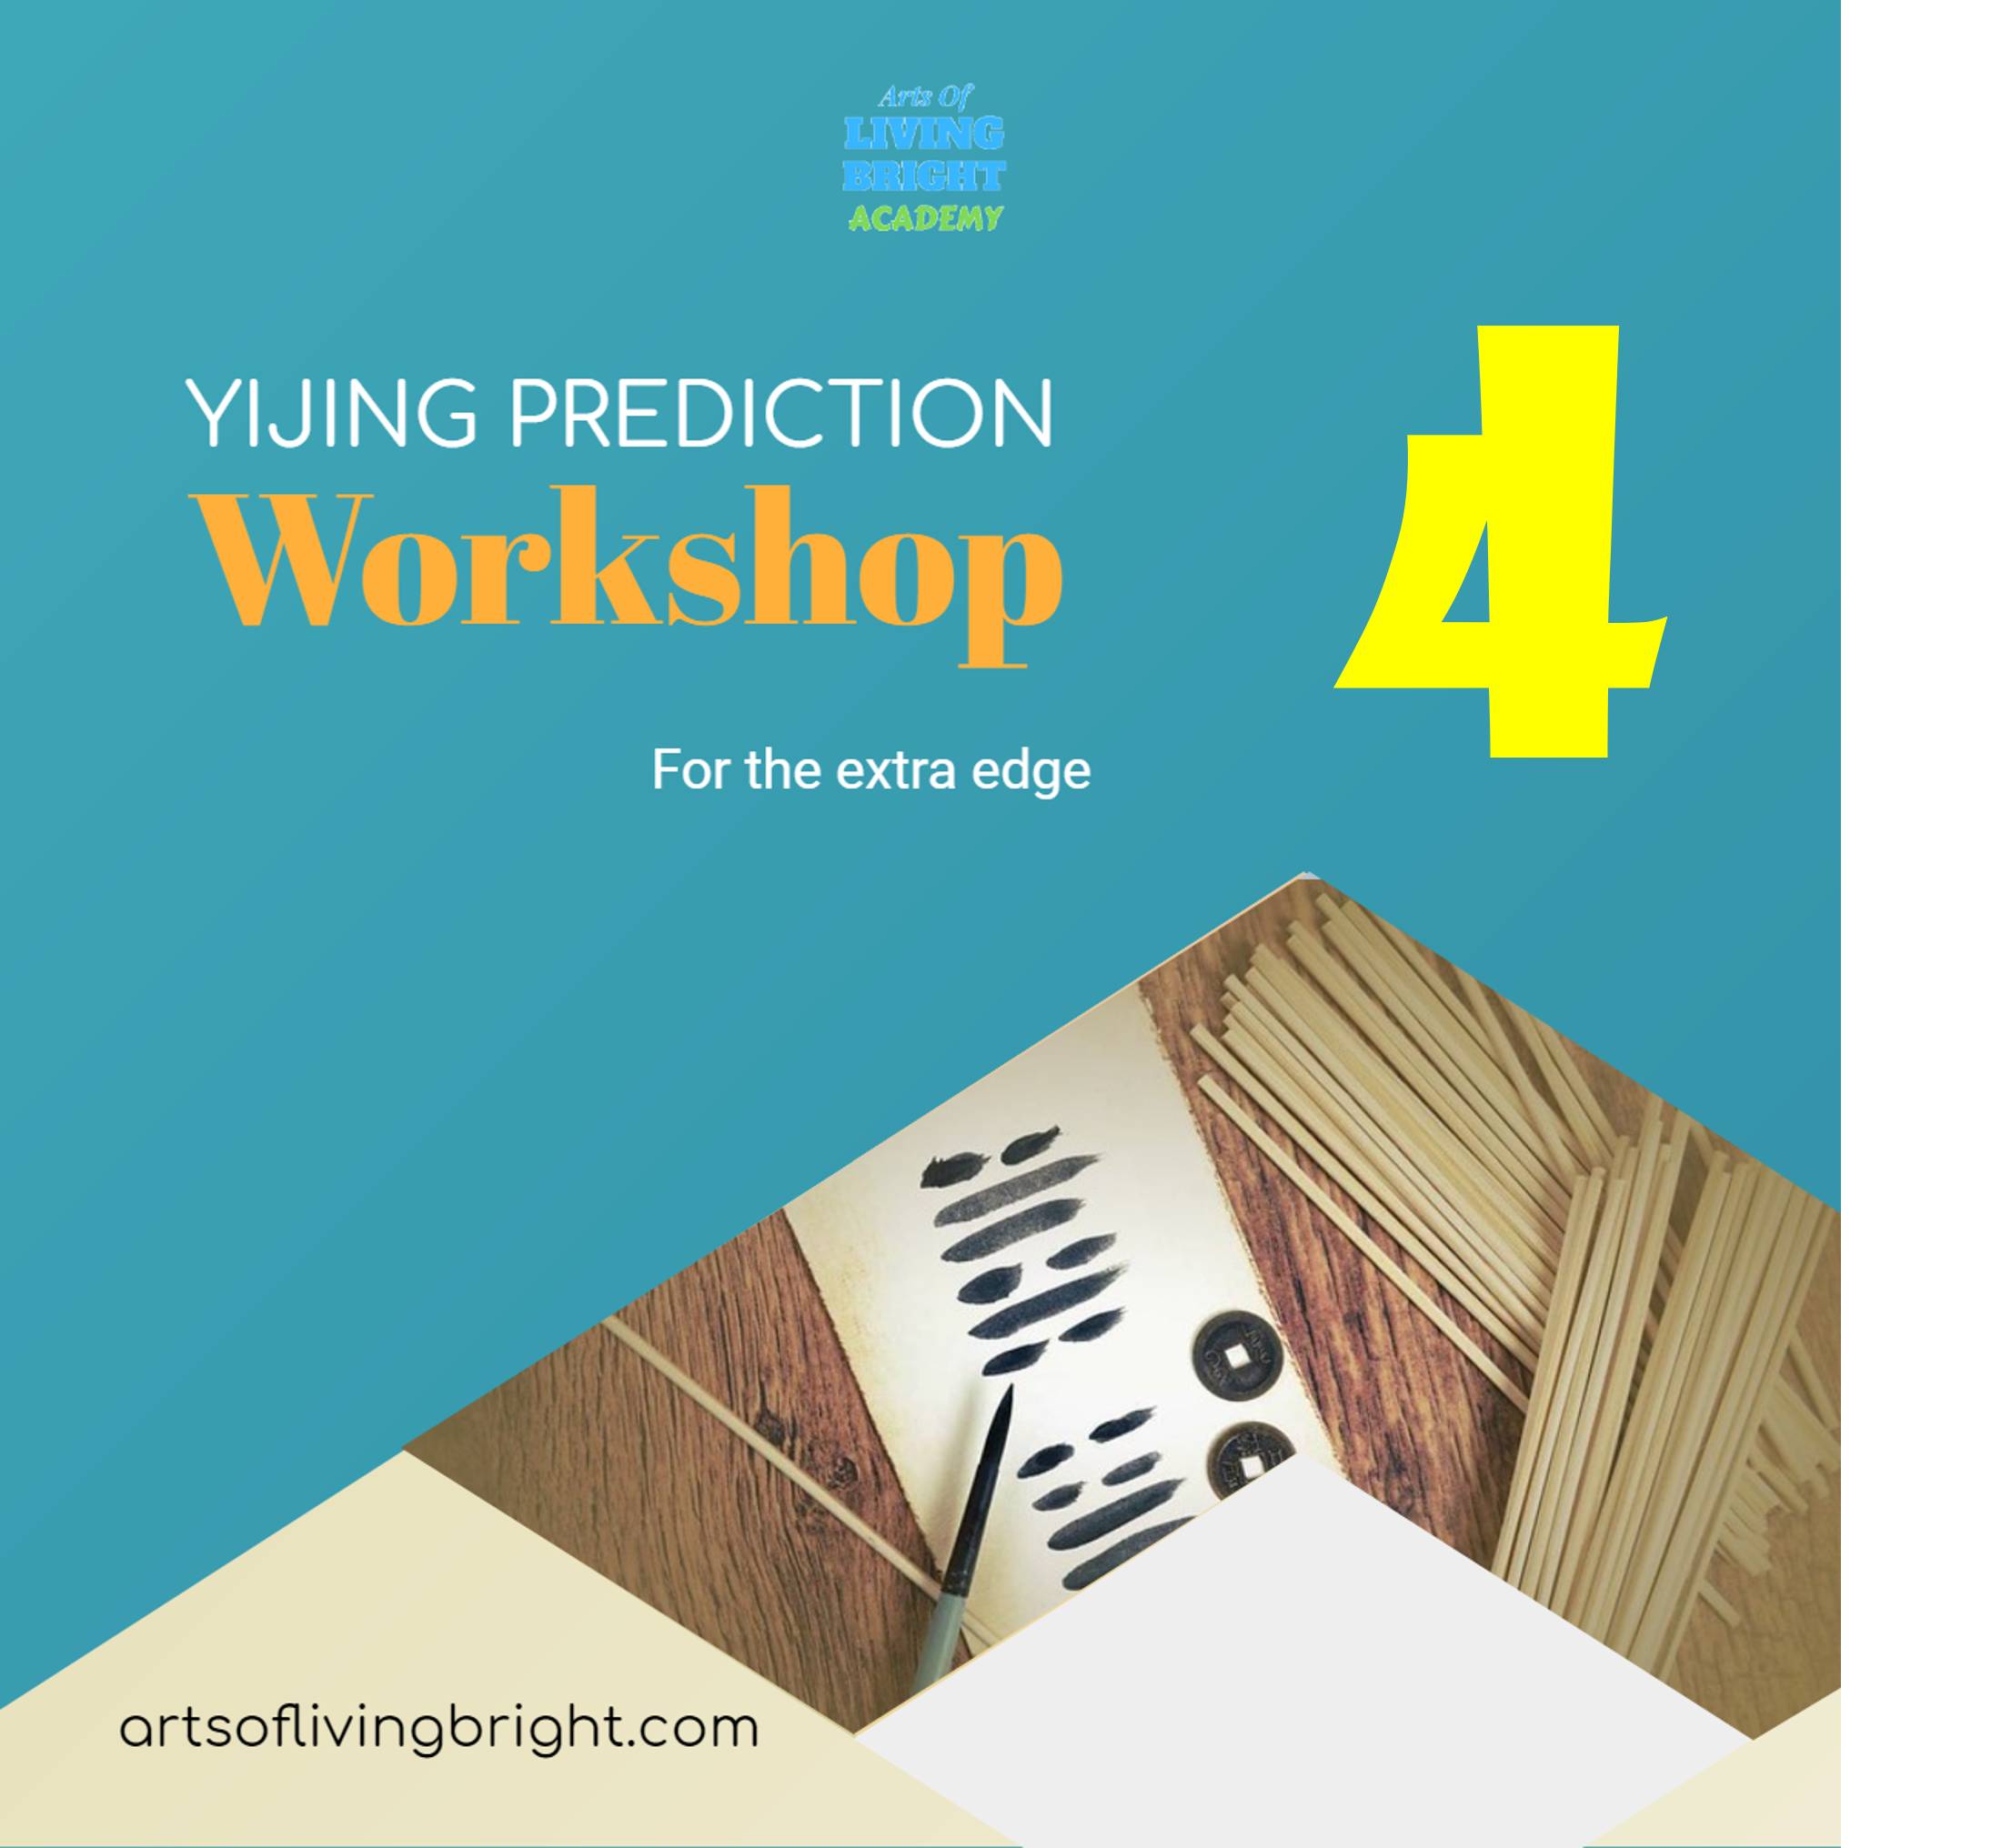 Yijing Prediction Workshop 4